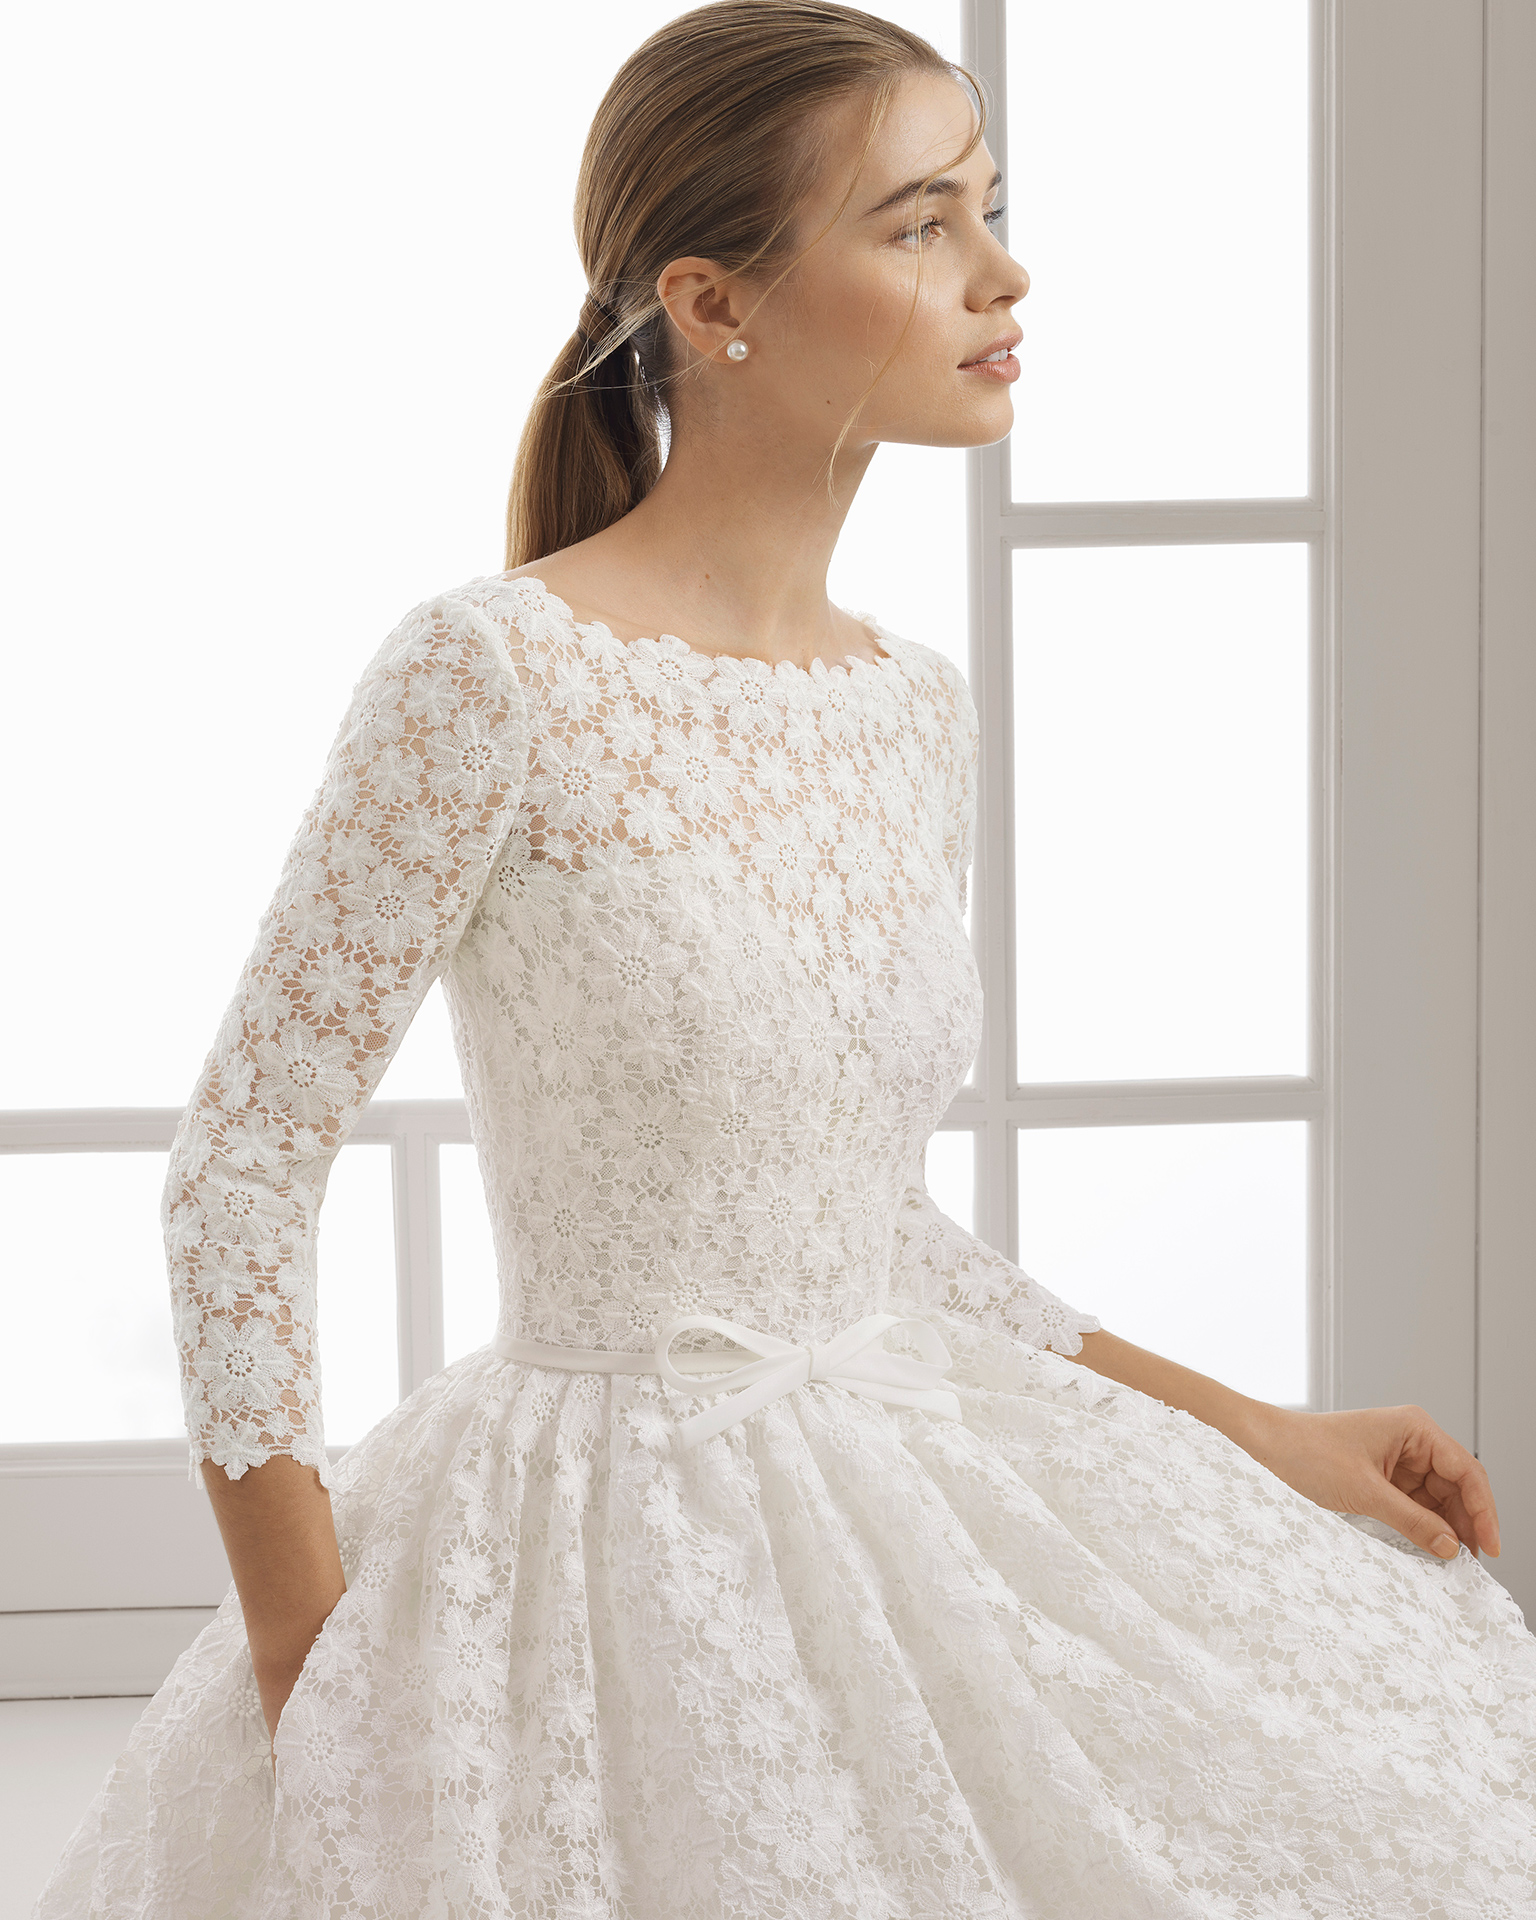 Vestido novia corto manga larga